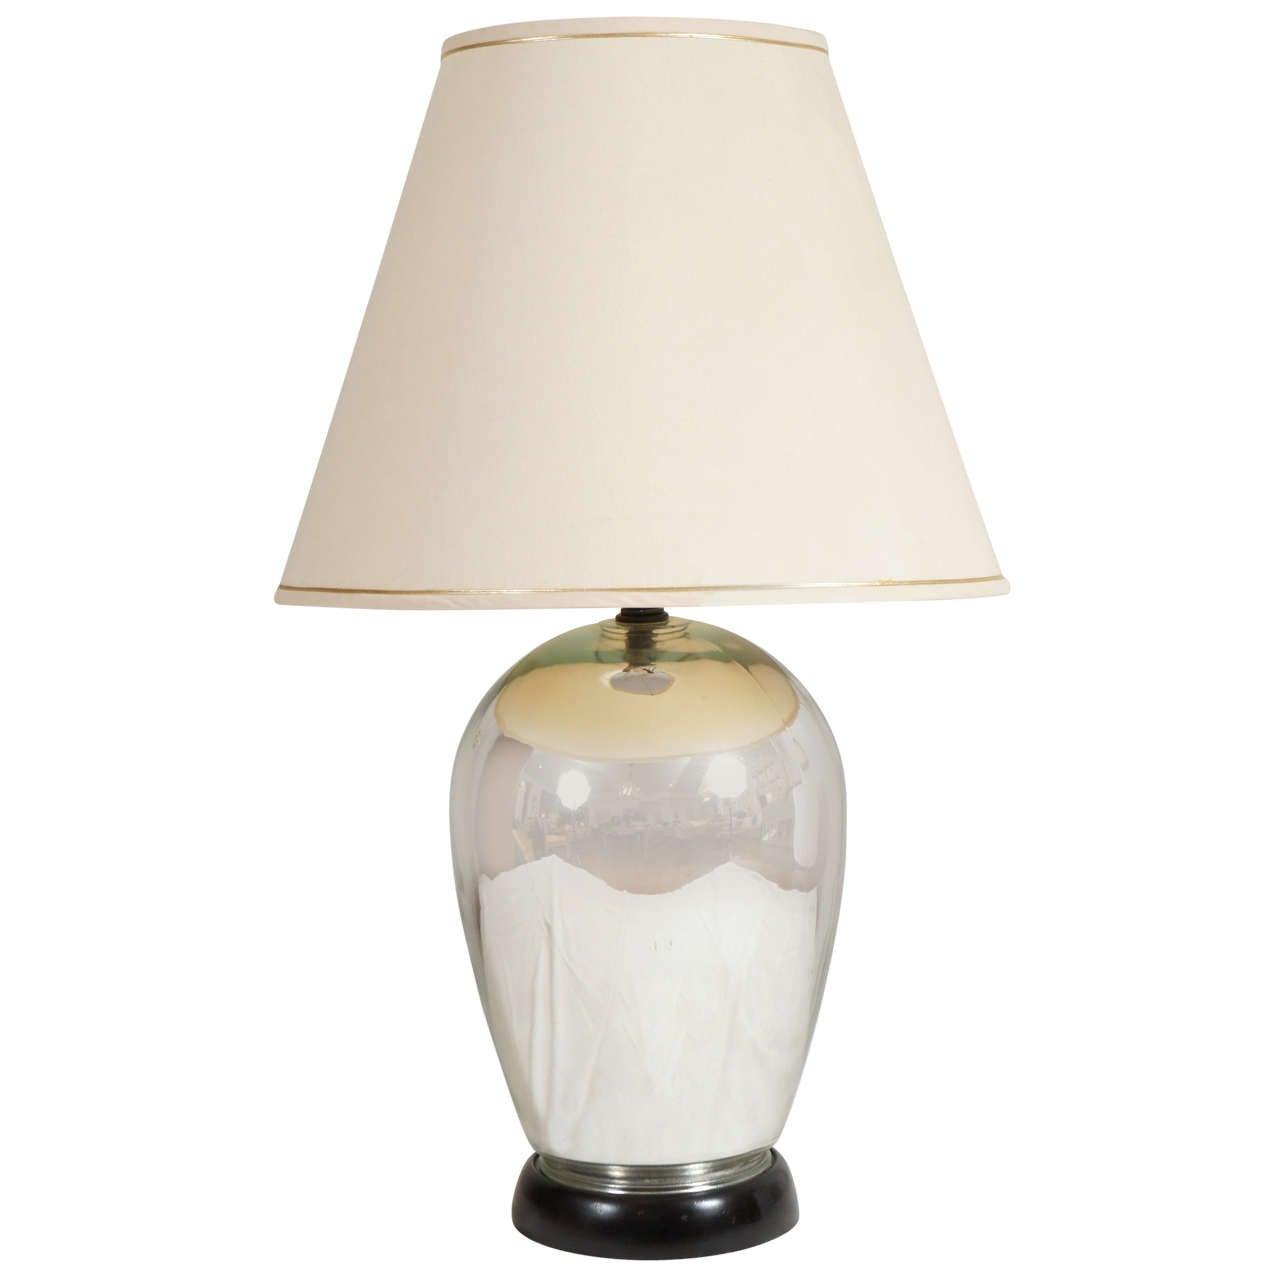 mercury table lamp at 1stdibs. Black Bedroom Furniture Sets. Home Design Ideas